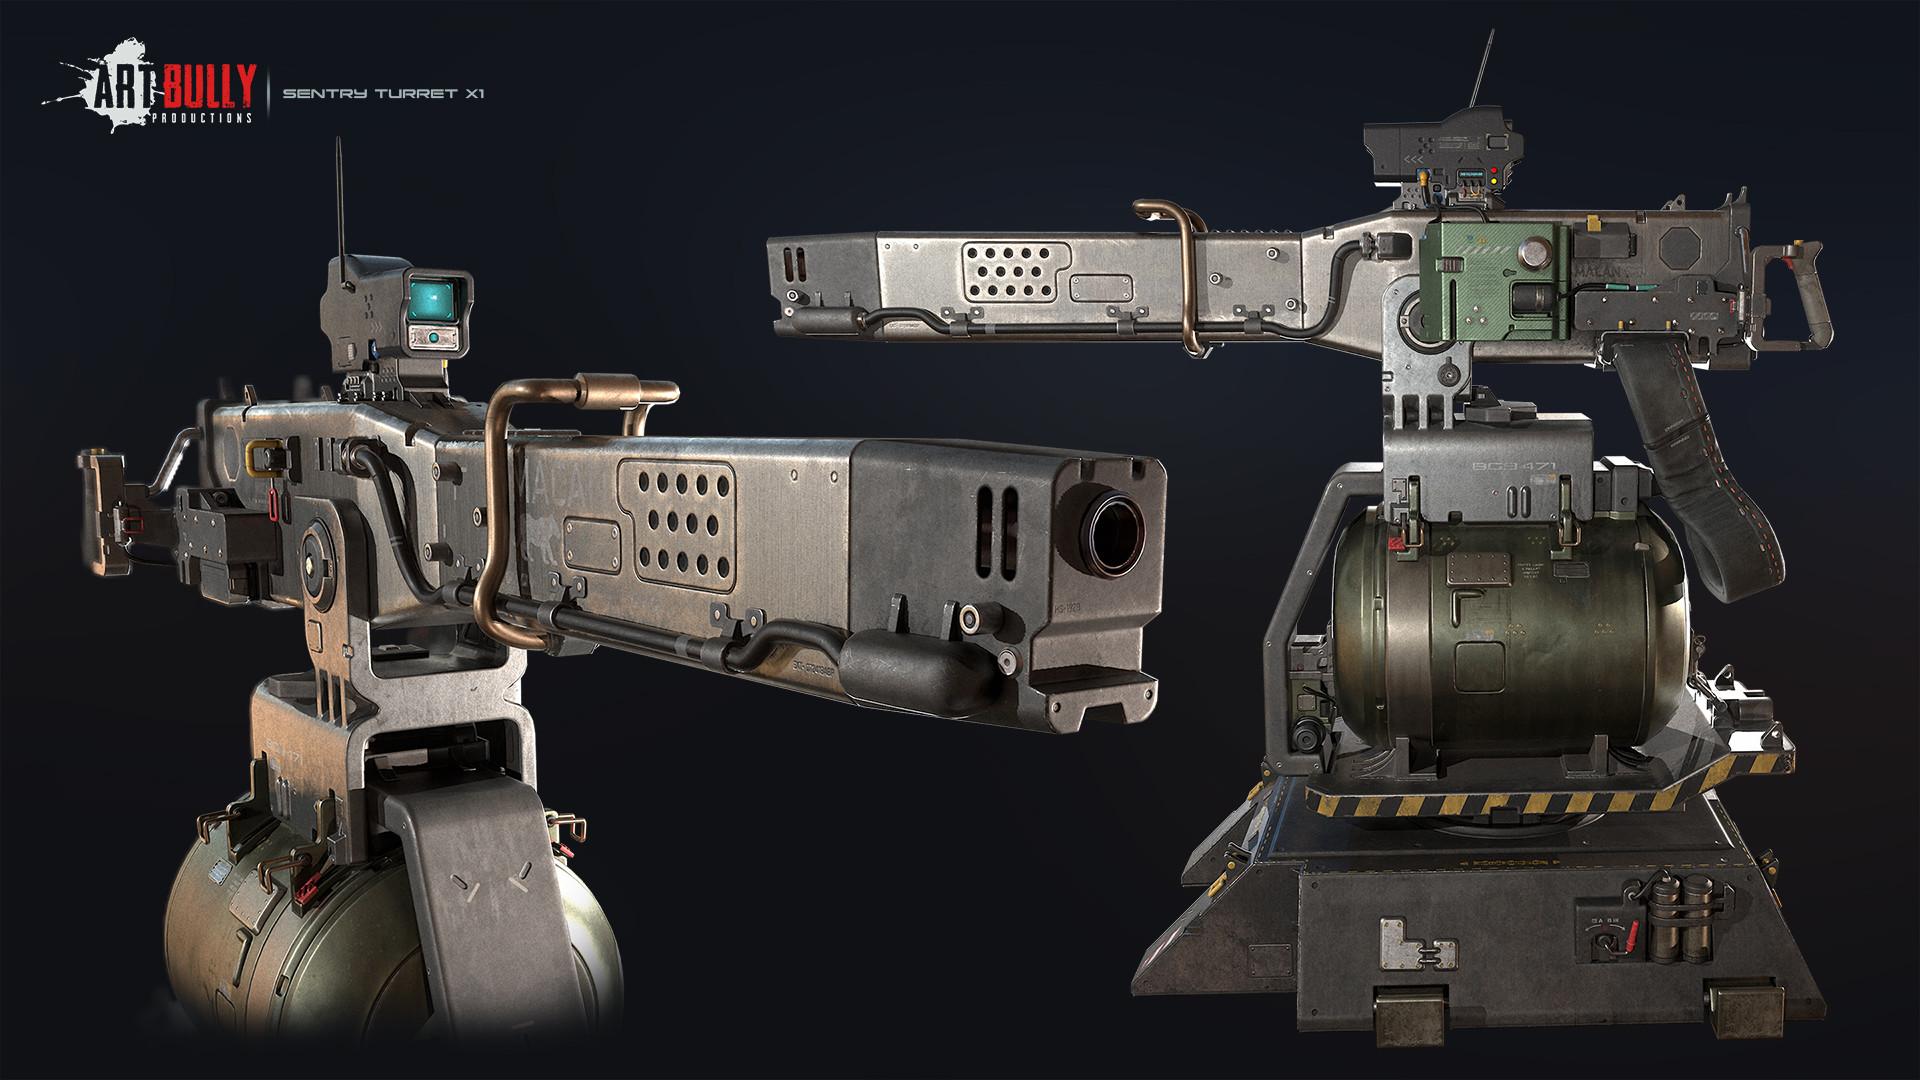 Patrick nuckels sentry turret x1 render 02